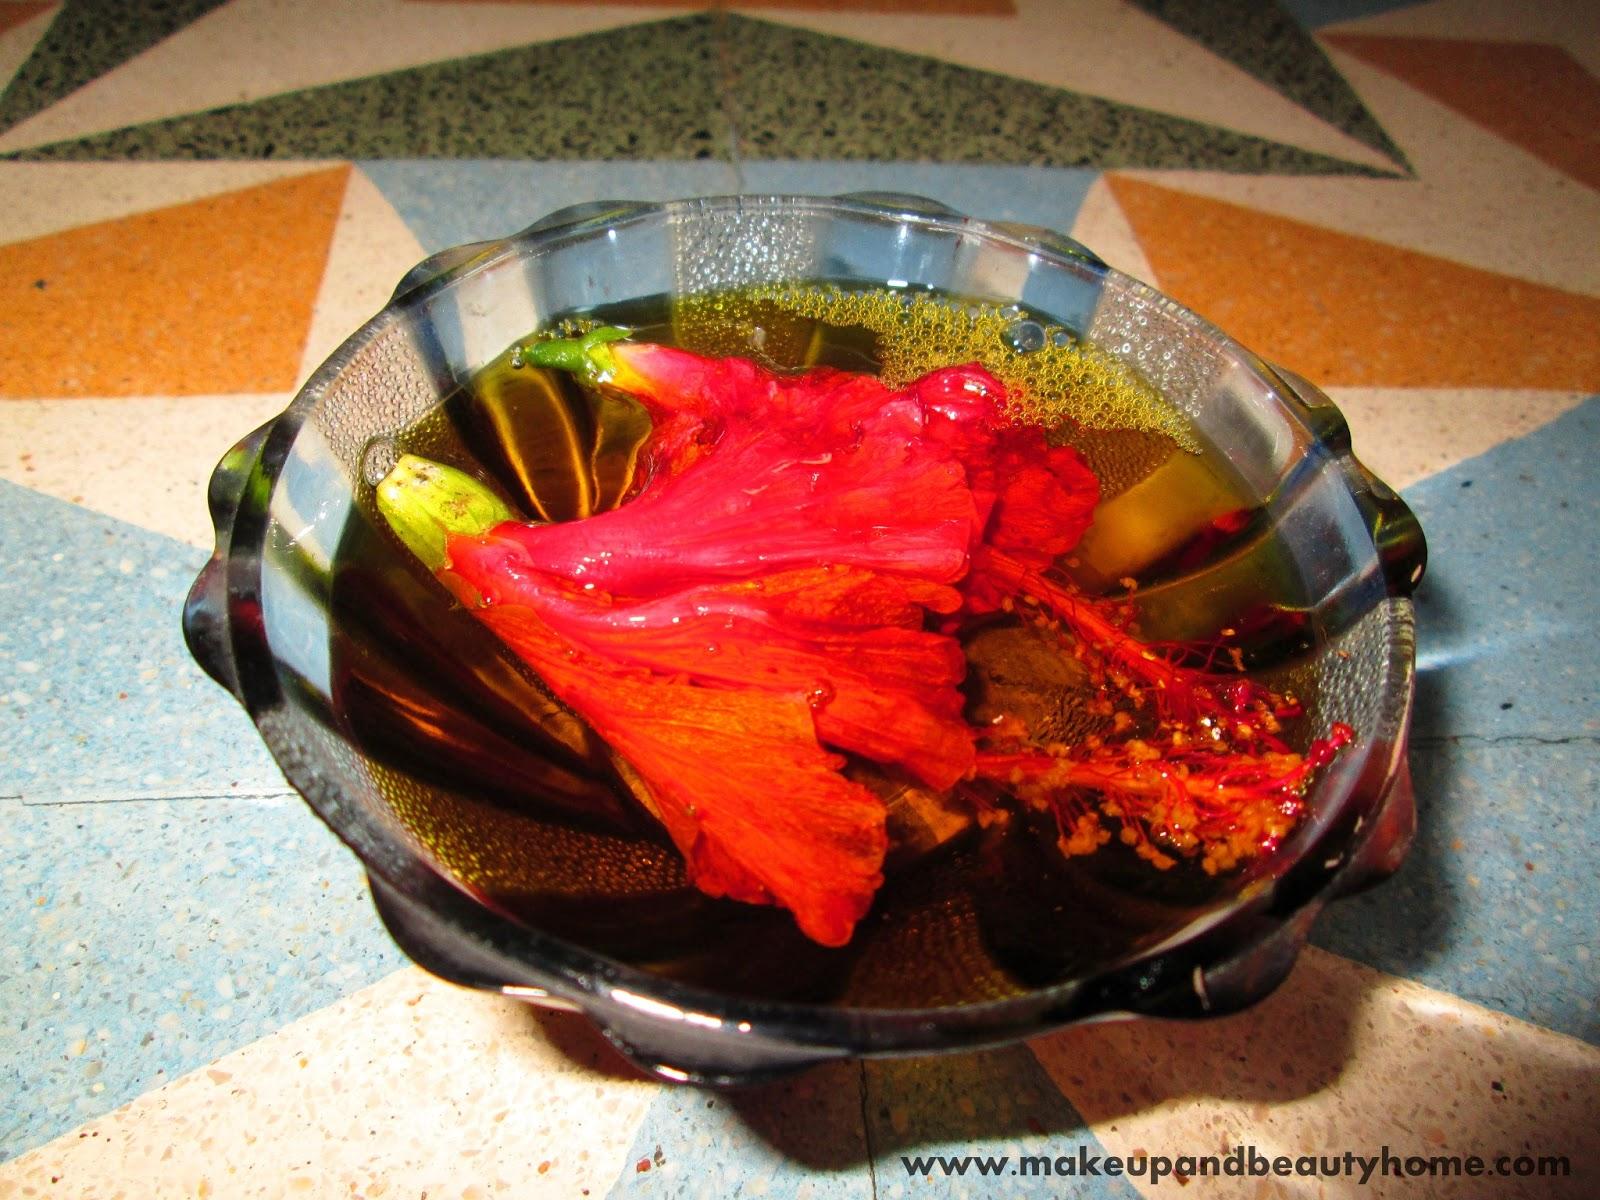 Diy hibiscus flower infused mustard hair oil for hair growth mabh blog hibiscus flowers in mustard oil hair growth recipe izmirmasajfo